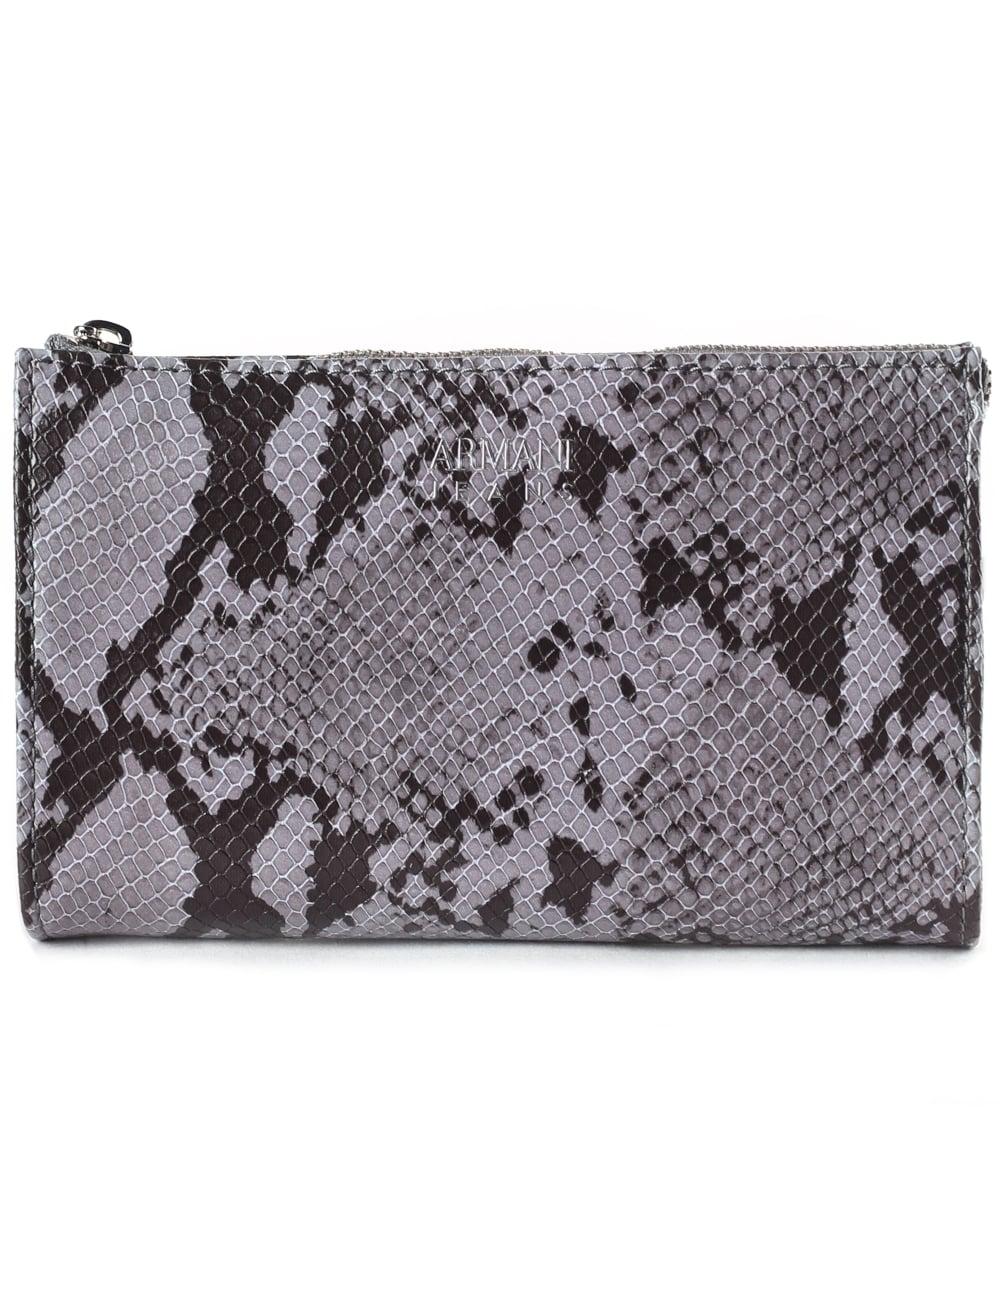 Armani Jeans Women s Python Small Bag 487ca996508e6